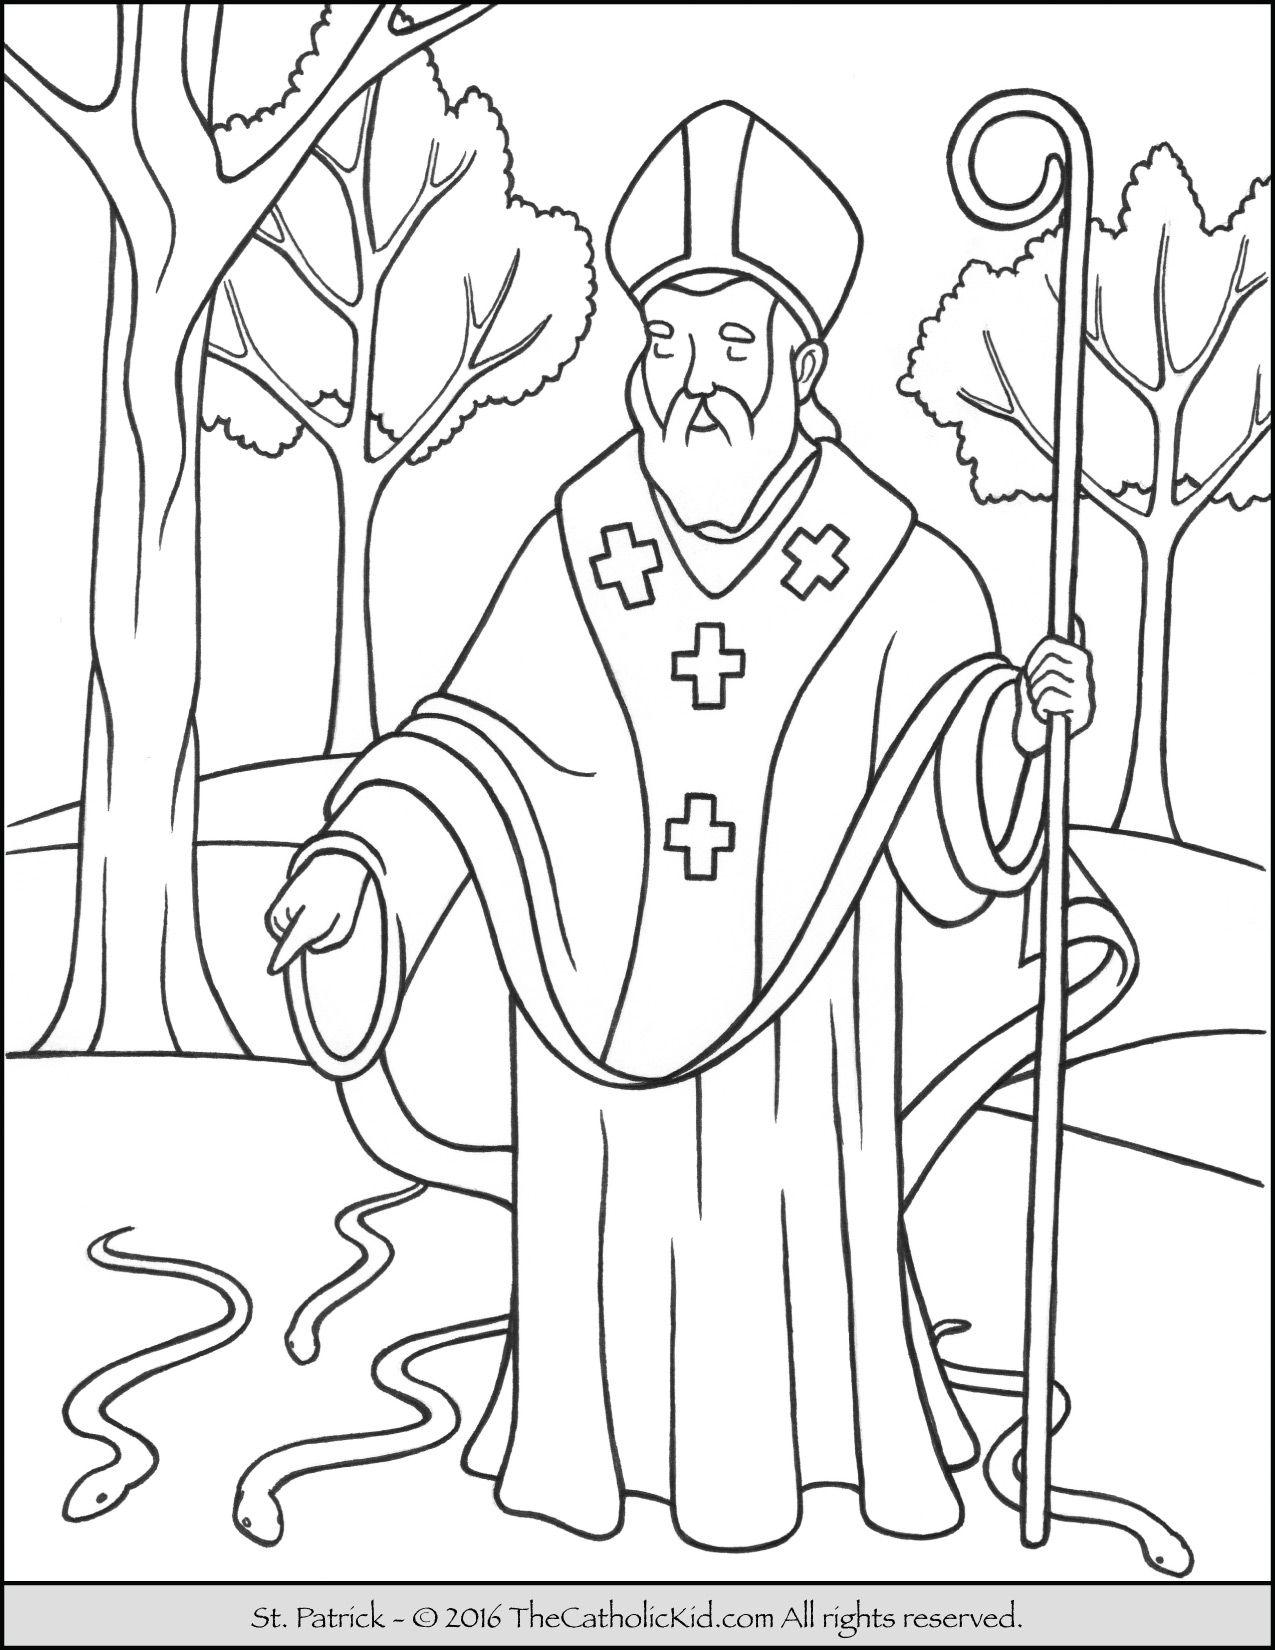 Saint Patrick Coloring Page The Catholic Kid Catholic Coloring